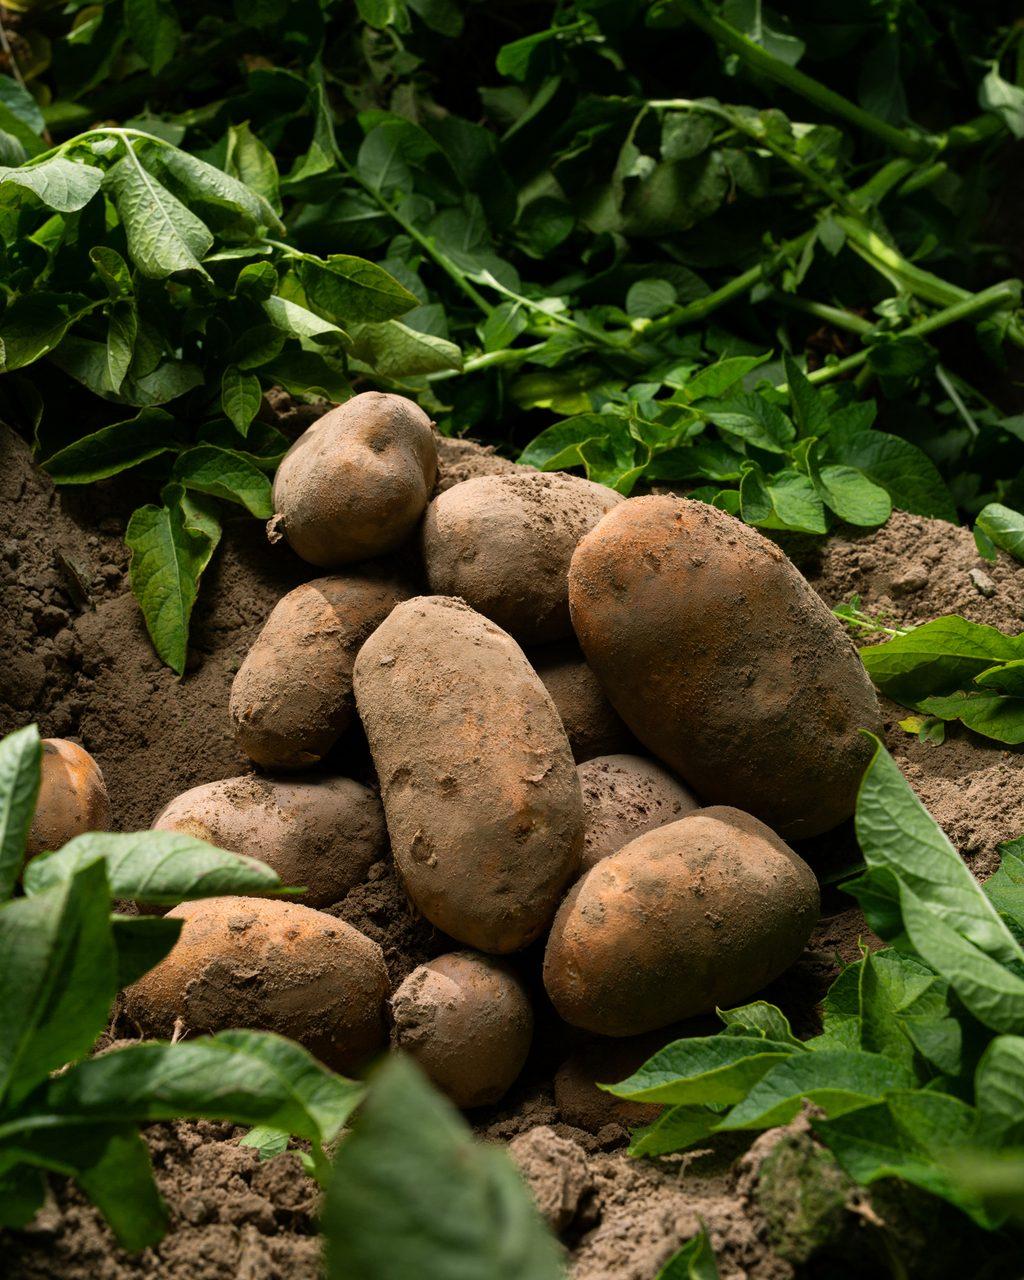 Plant community, Natural foods, Food, Tuber, Grass